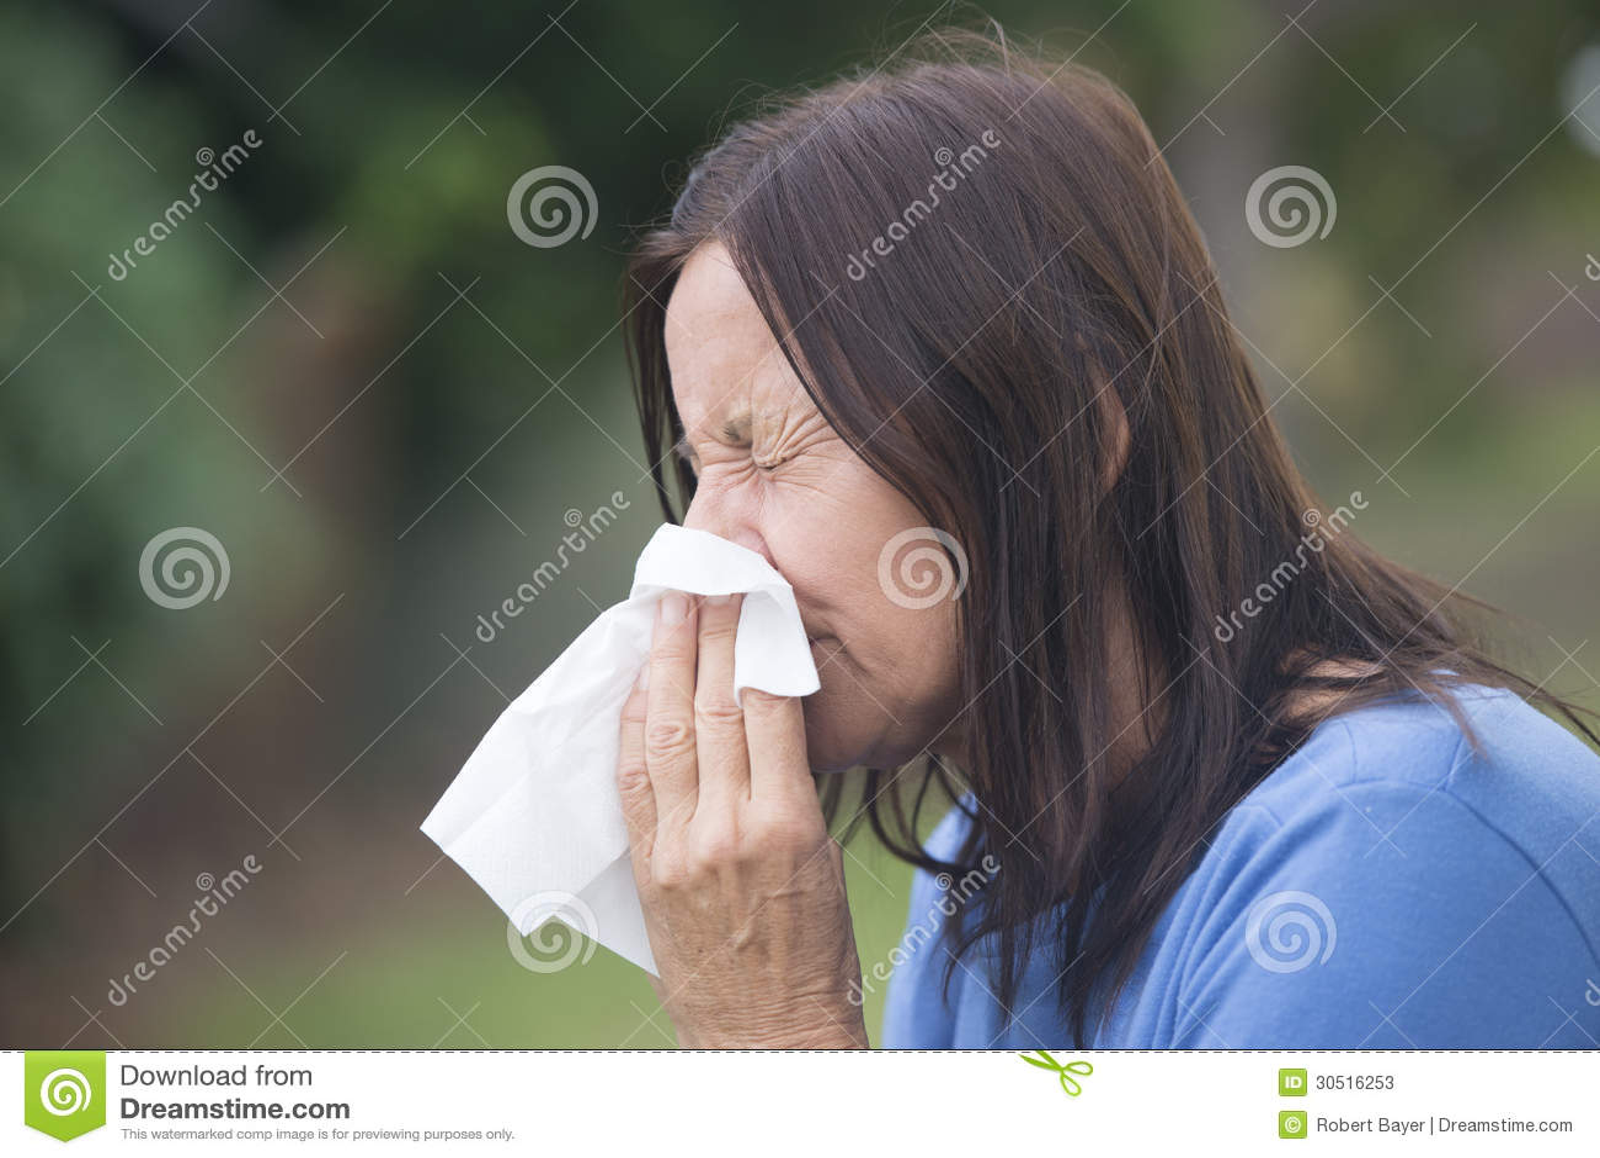 Infekktion - Suffering Spirits